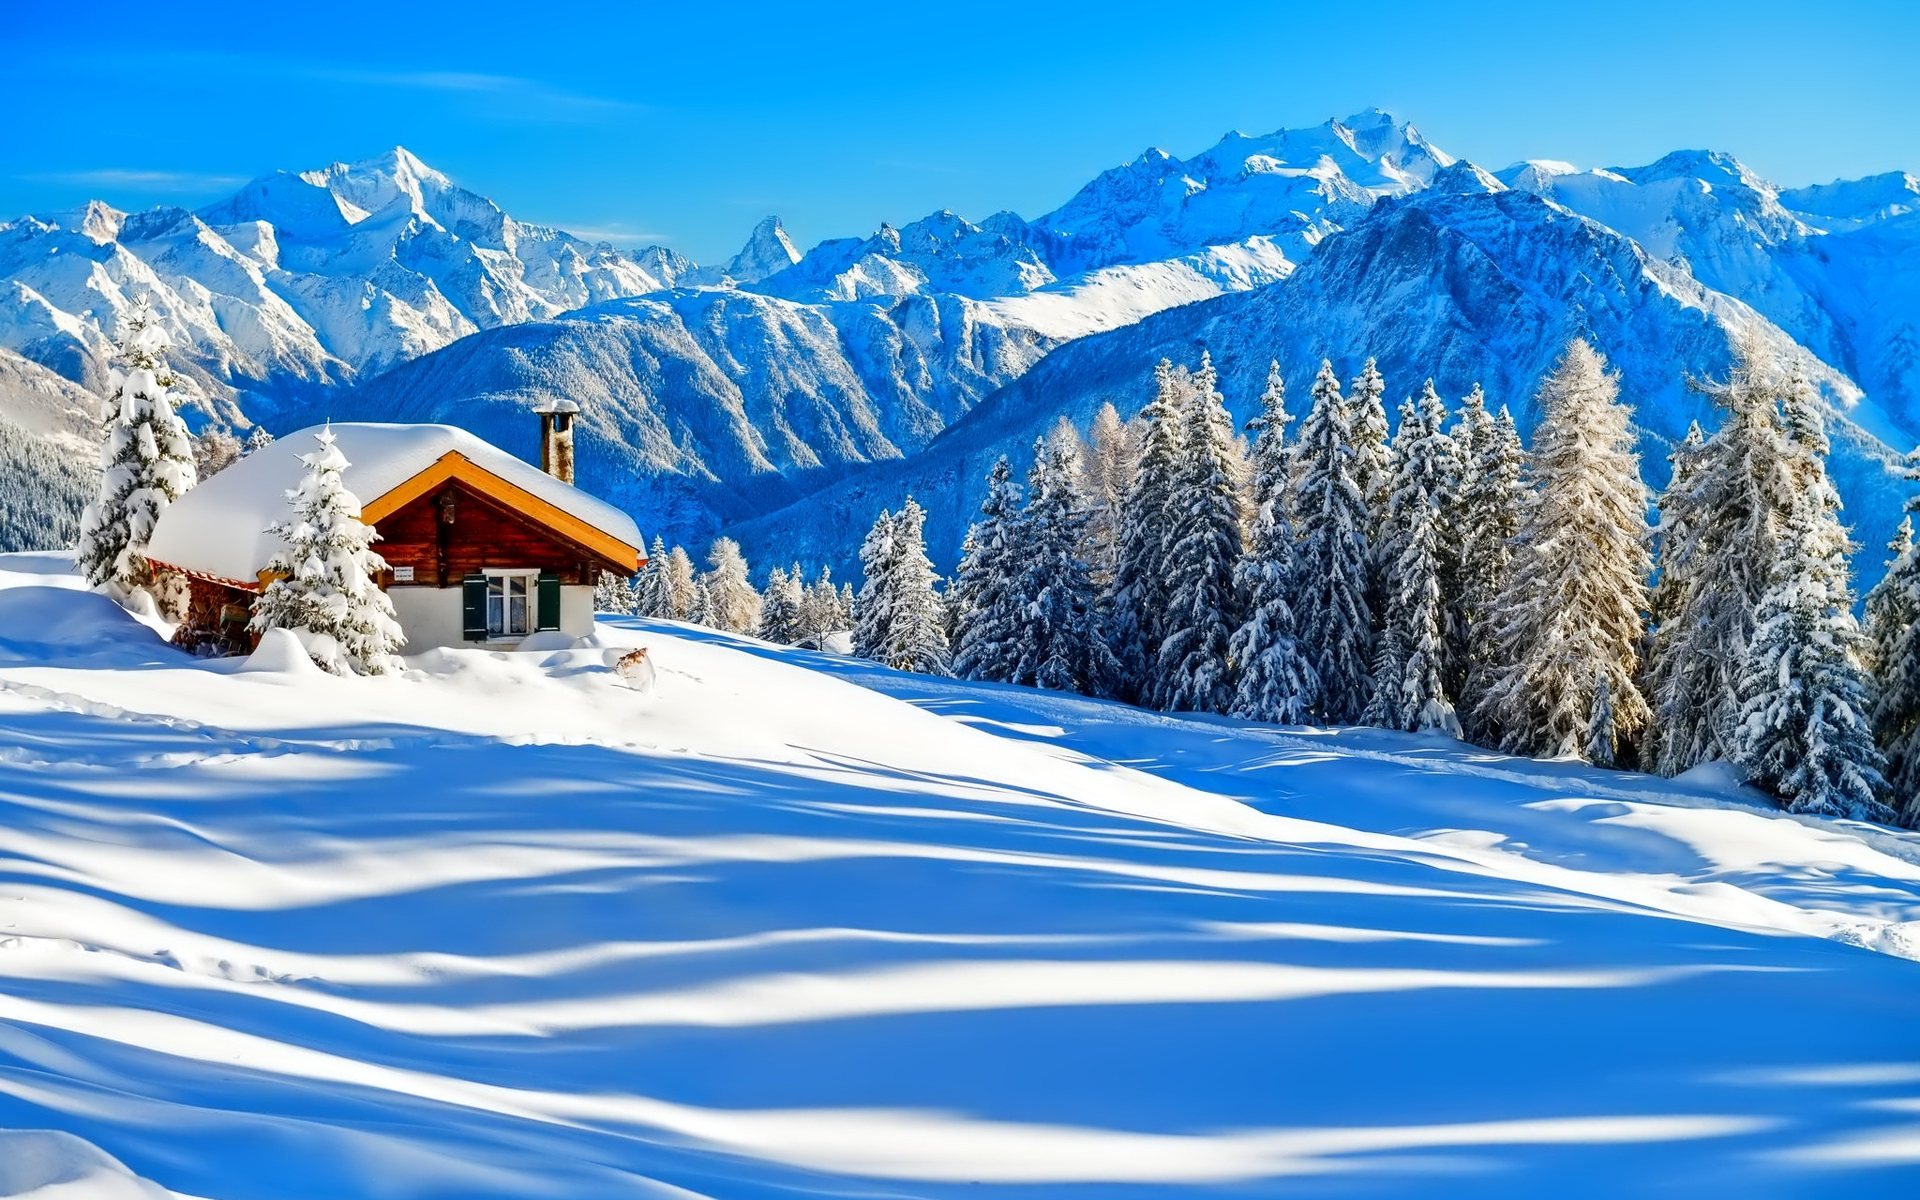 Beautiful winter wallpaper photos M: Winter Magic: Beautiful Holiday